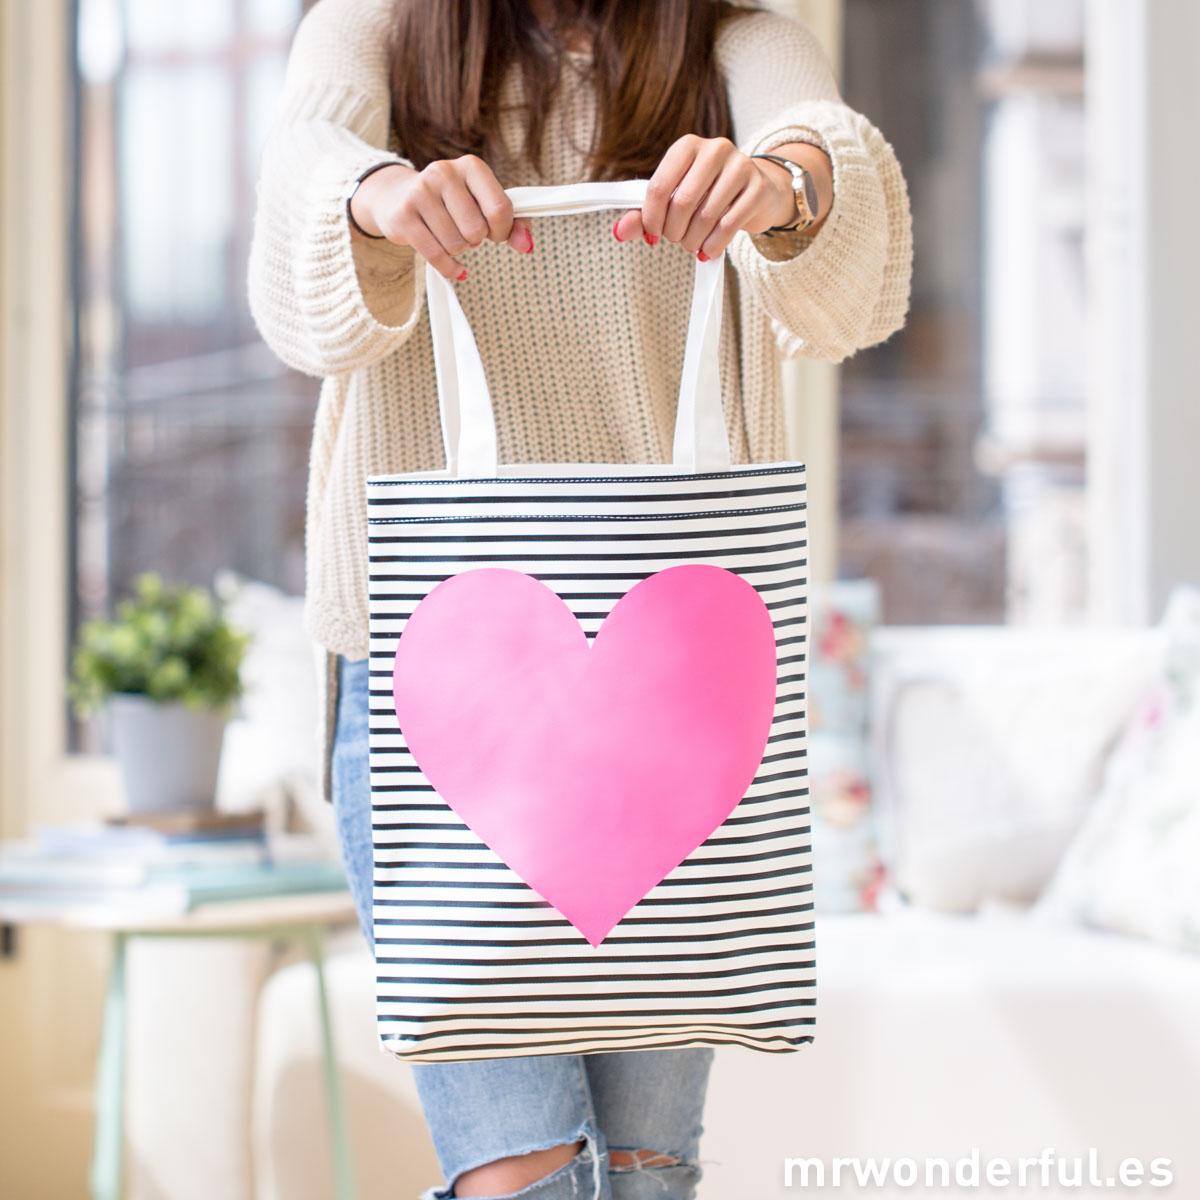 mrwonderful_14070116_Bolsa-tela-Heart-stripe-3-Editar